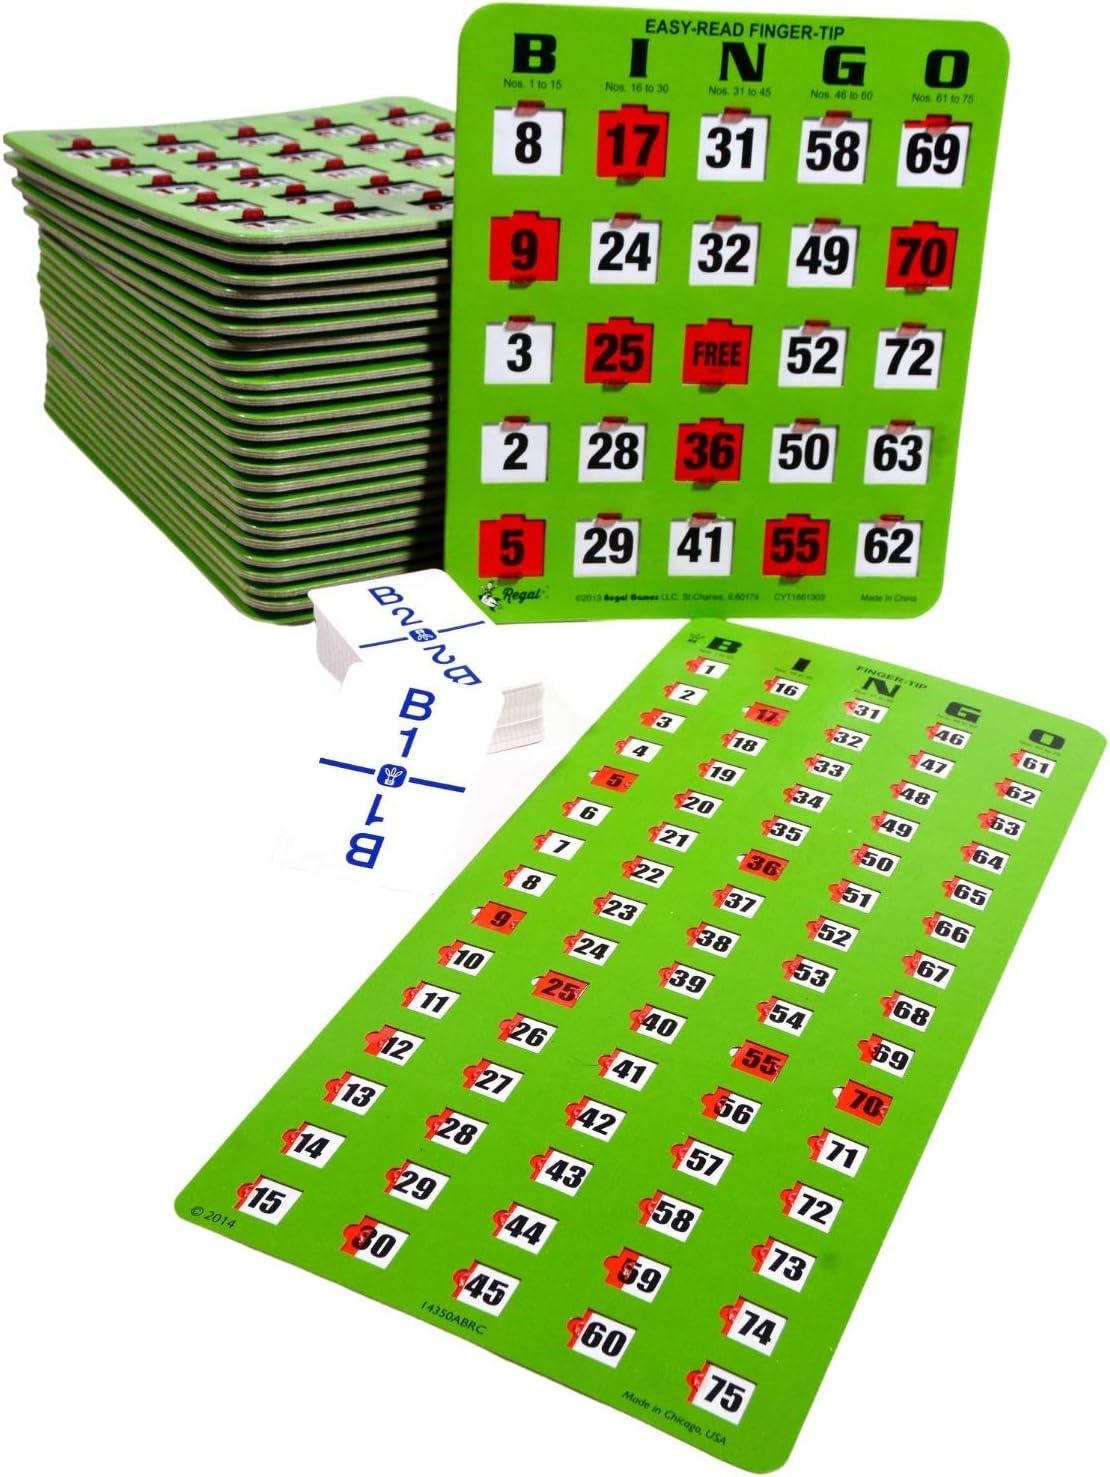 Regal Games Jumbo Finger-Tip Shutter Slide Card Set Bingo Free shipping on posting reviews with Kansas City Mall M